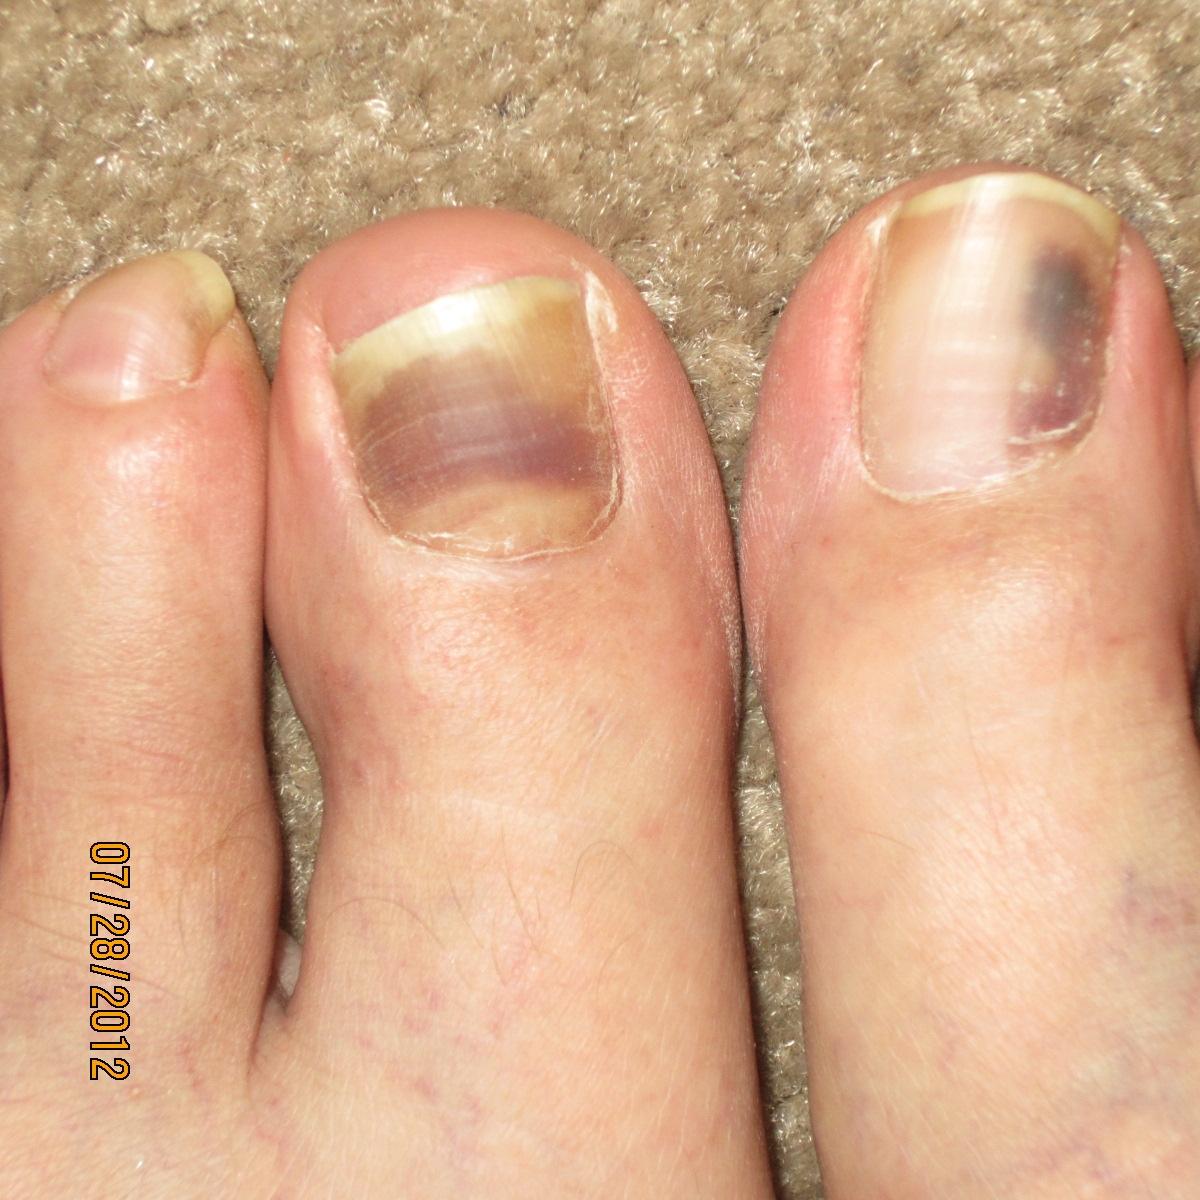 Yellow Nail Polish Toenails: White Toenail Discoloration From Nail Polish